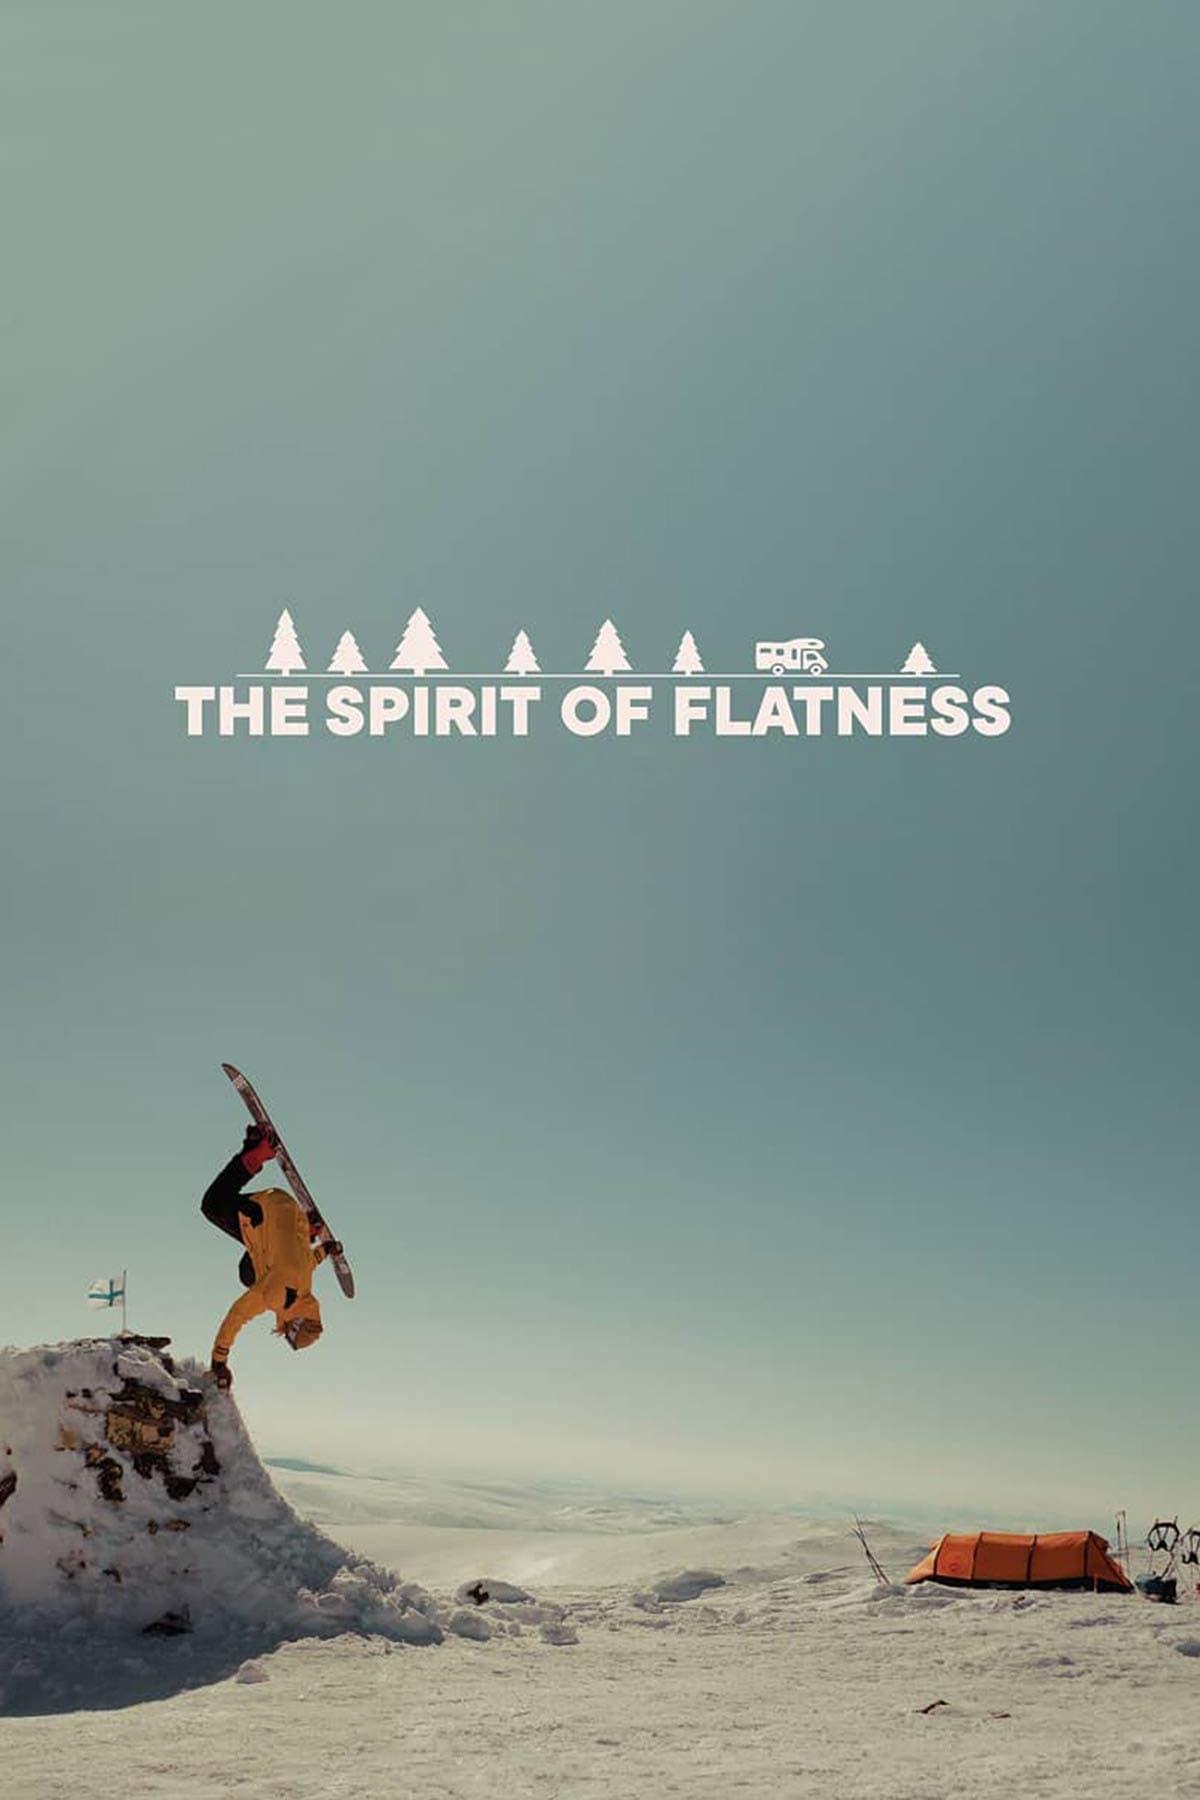 The Spirit of Flatness